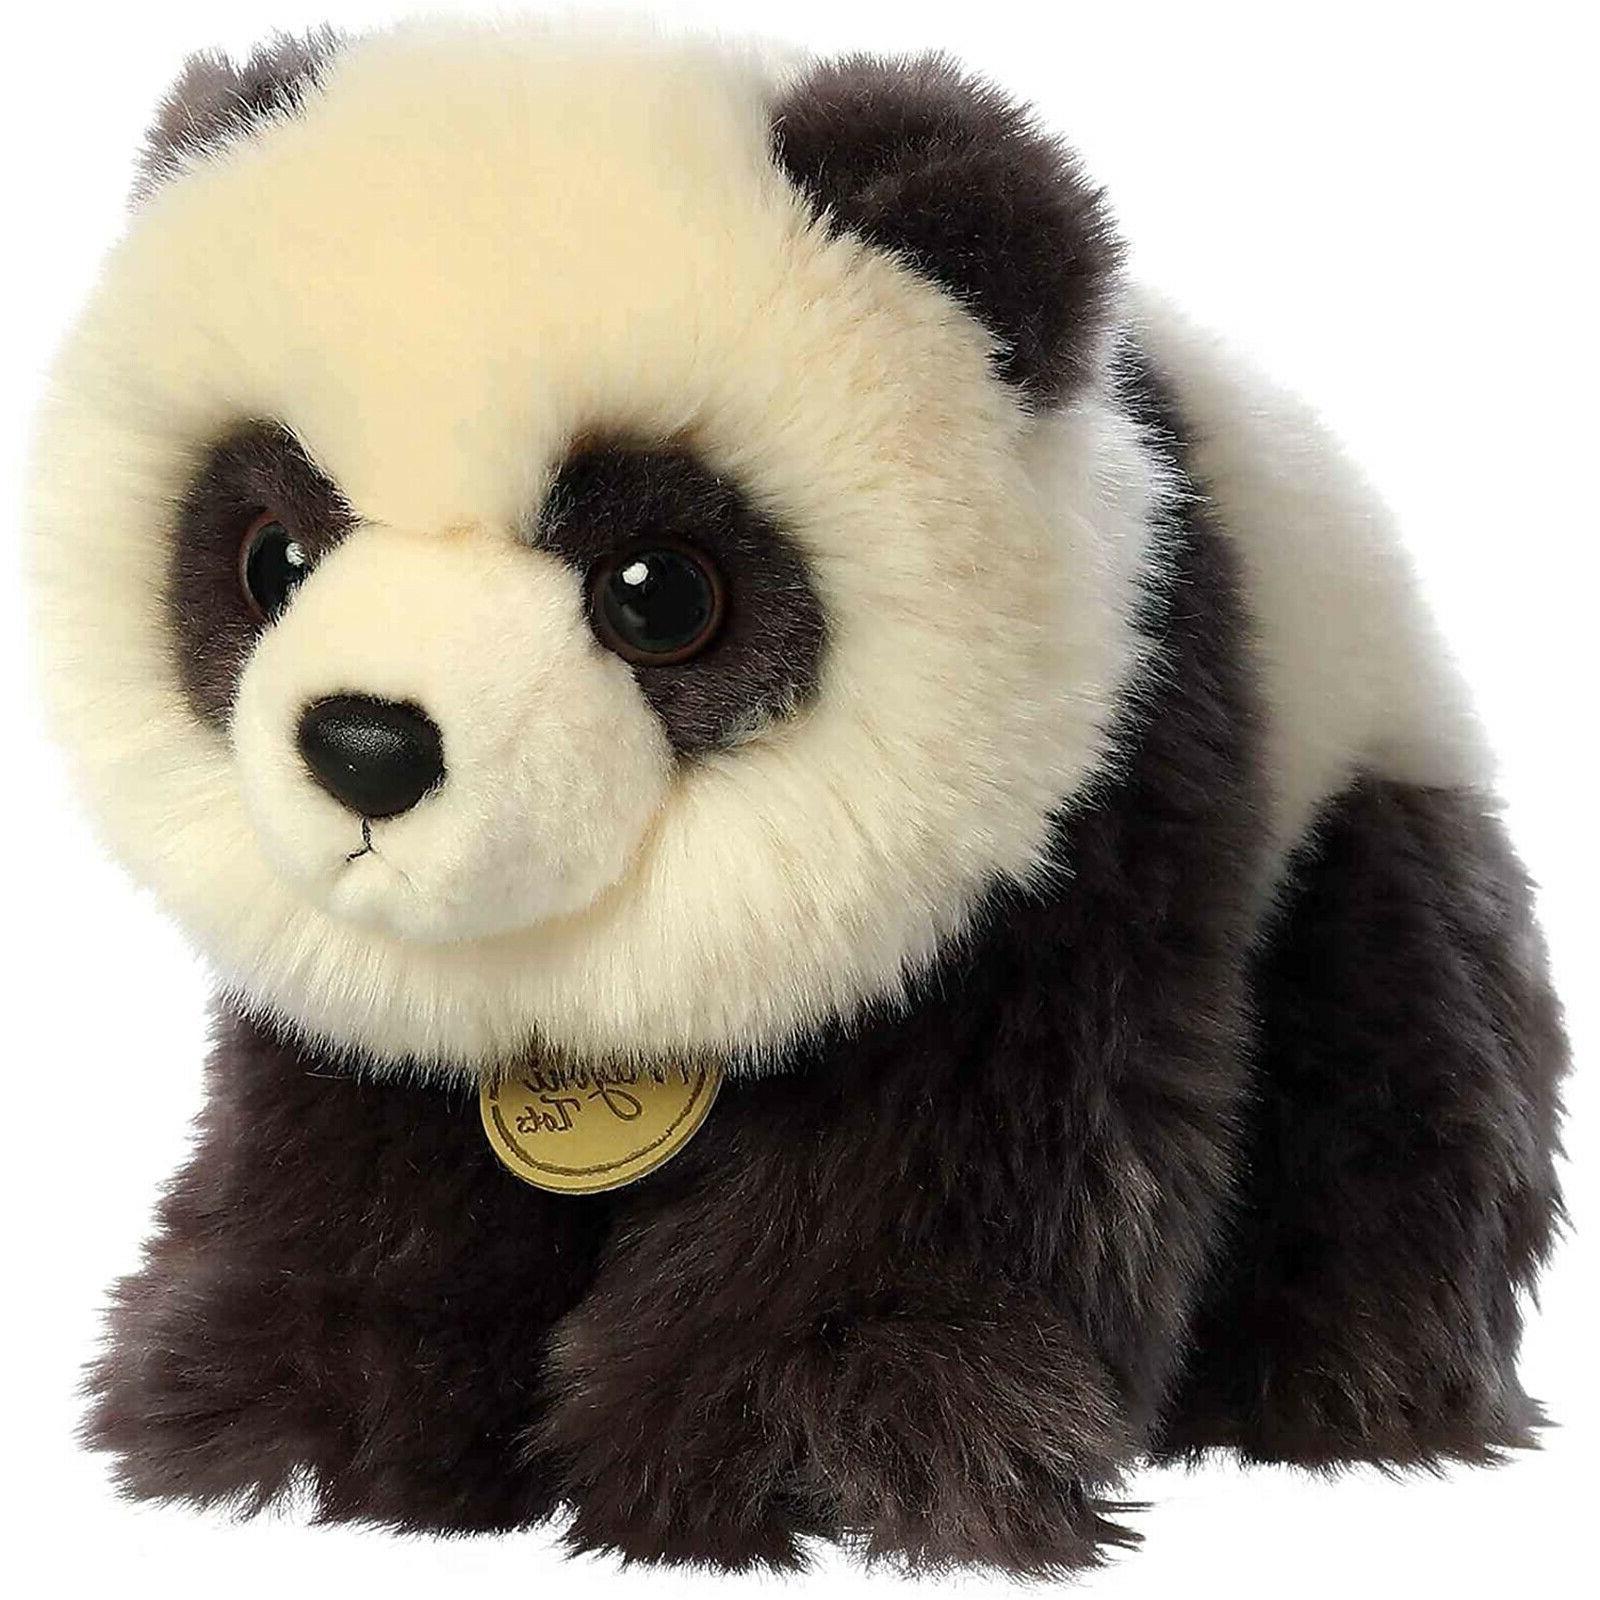 miyoni 9 panda cub